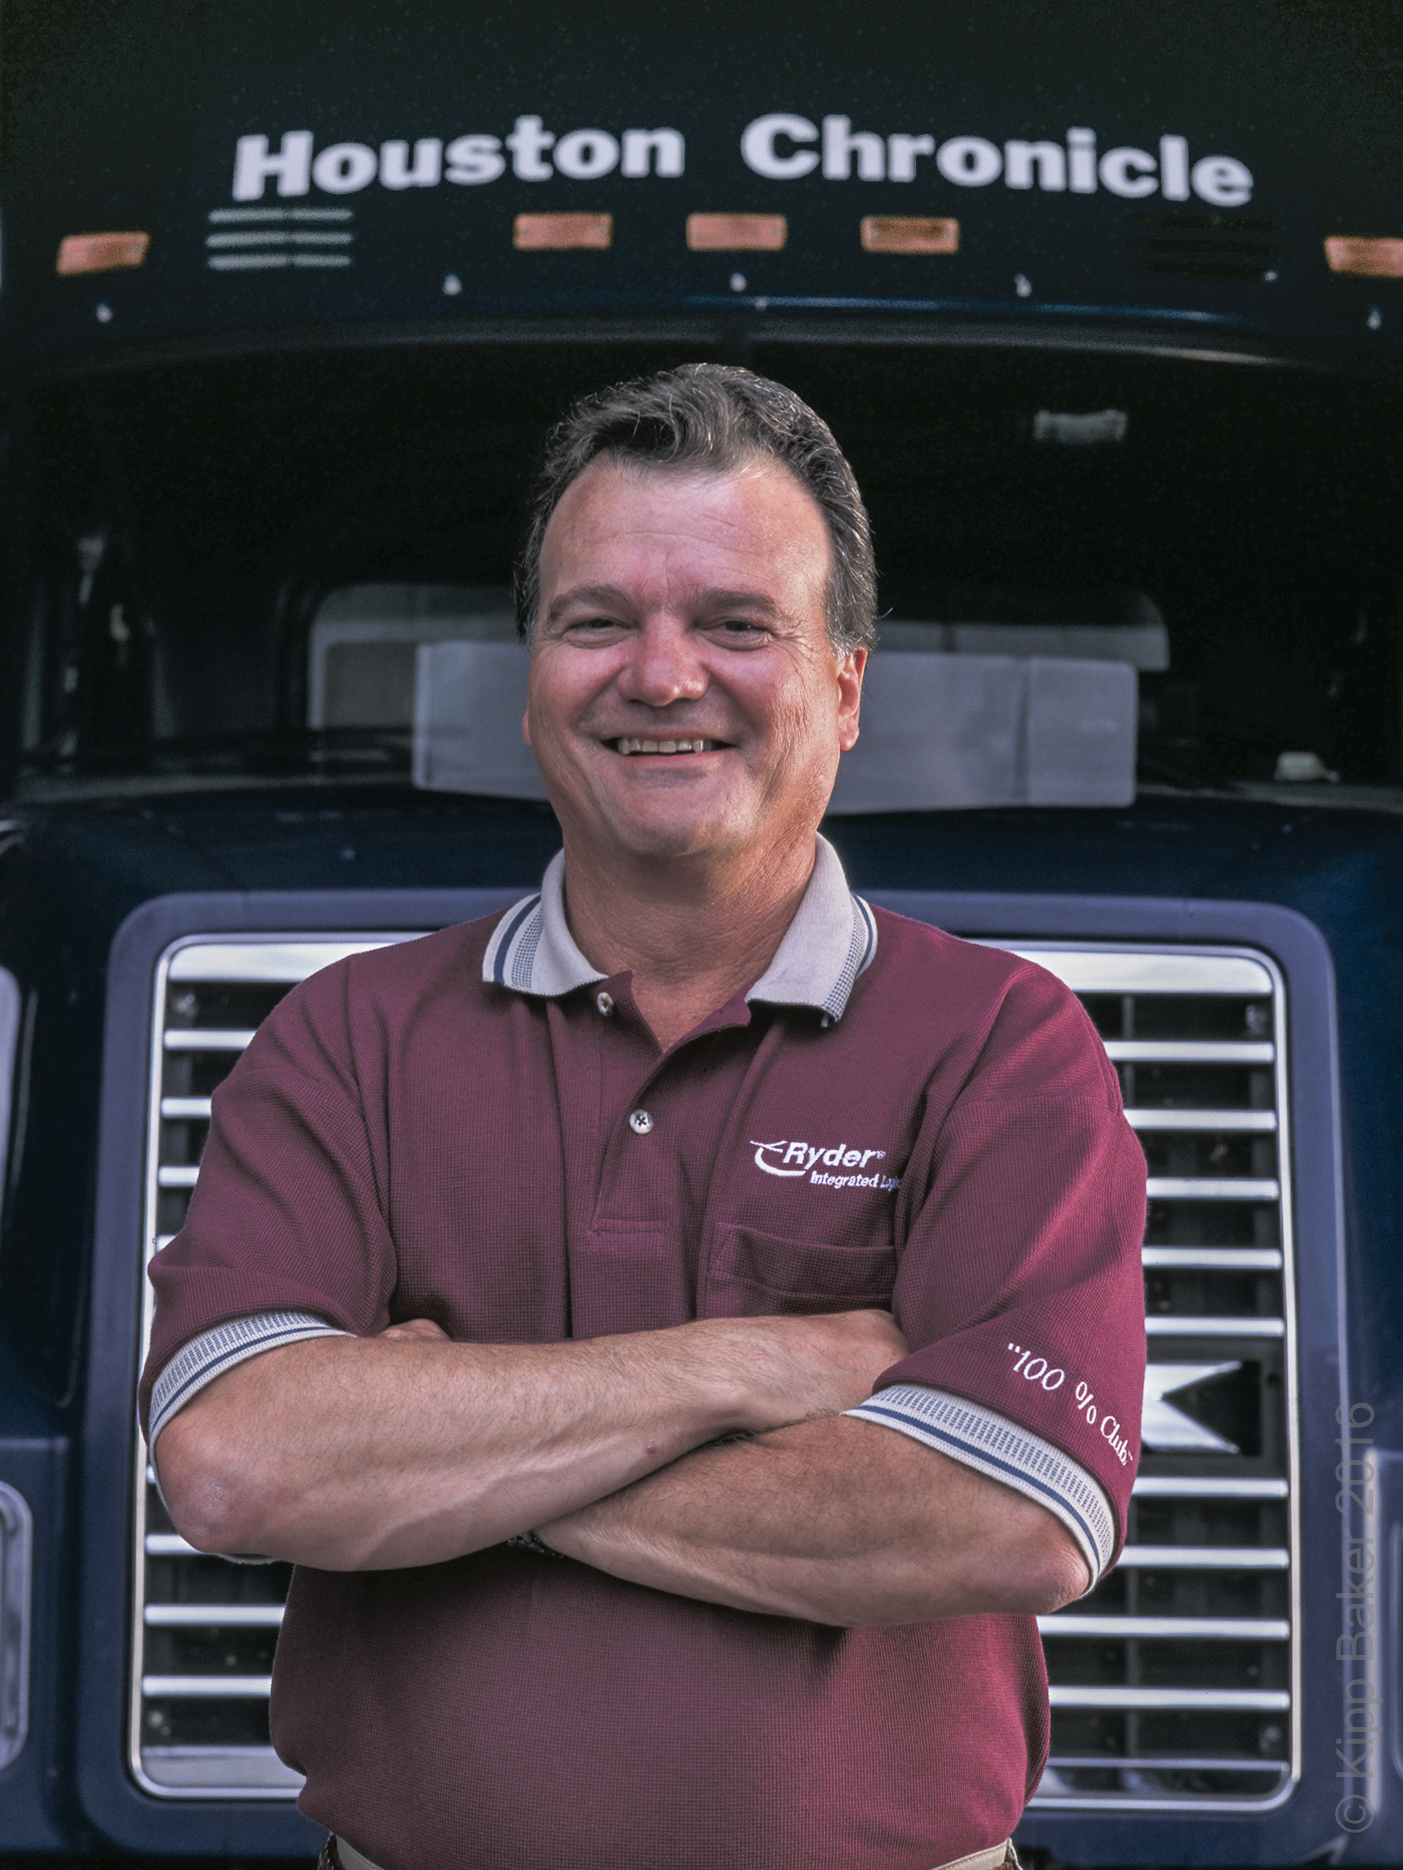 Manager, Ryder Logistics Copyright © Kipp Baker, All rights reserved